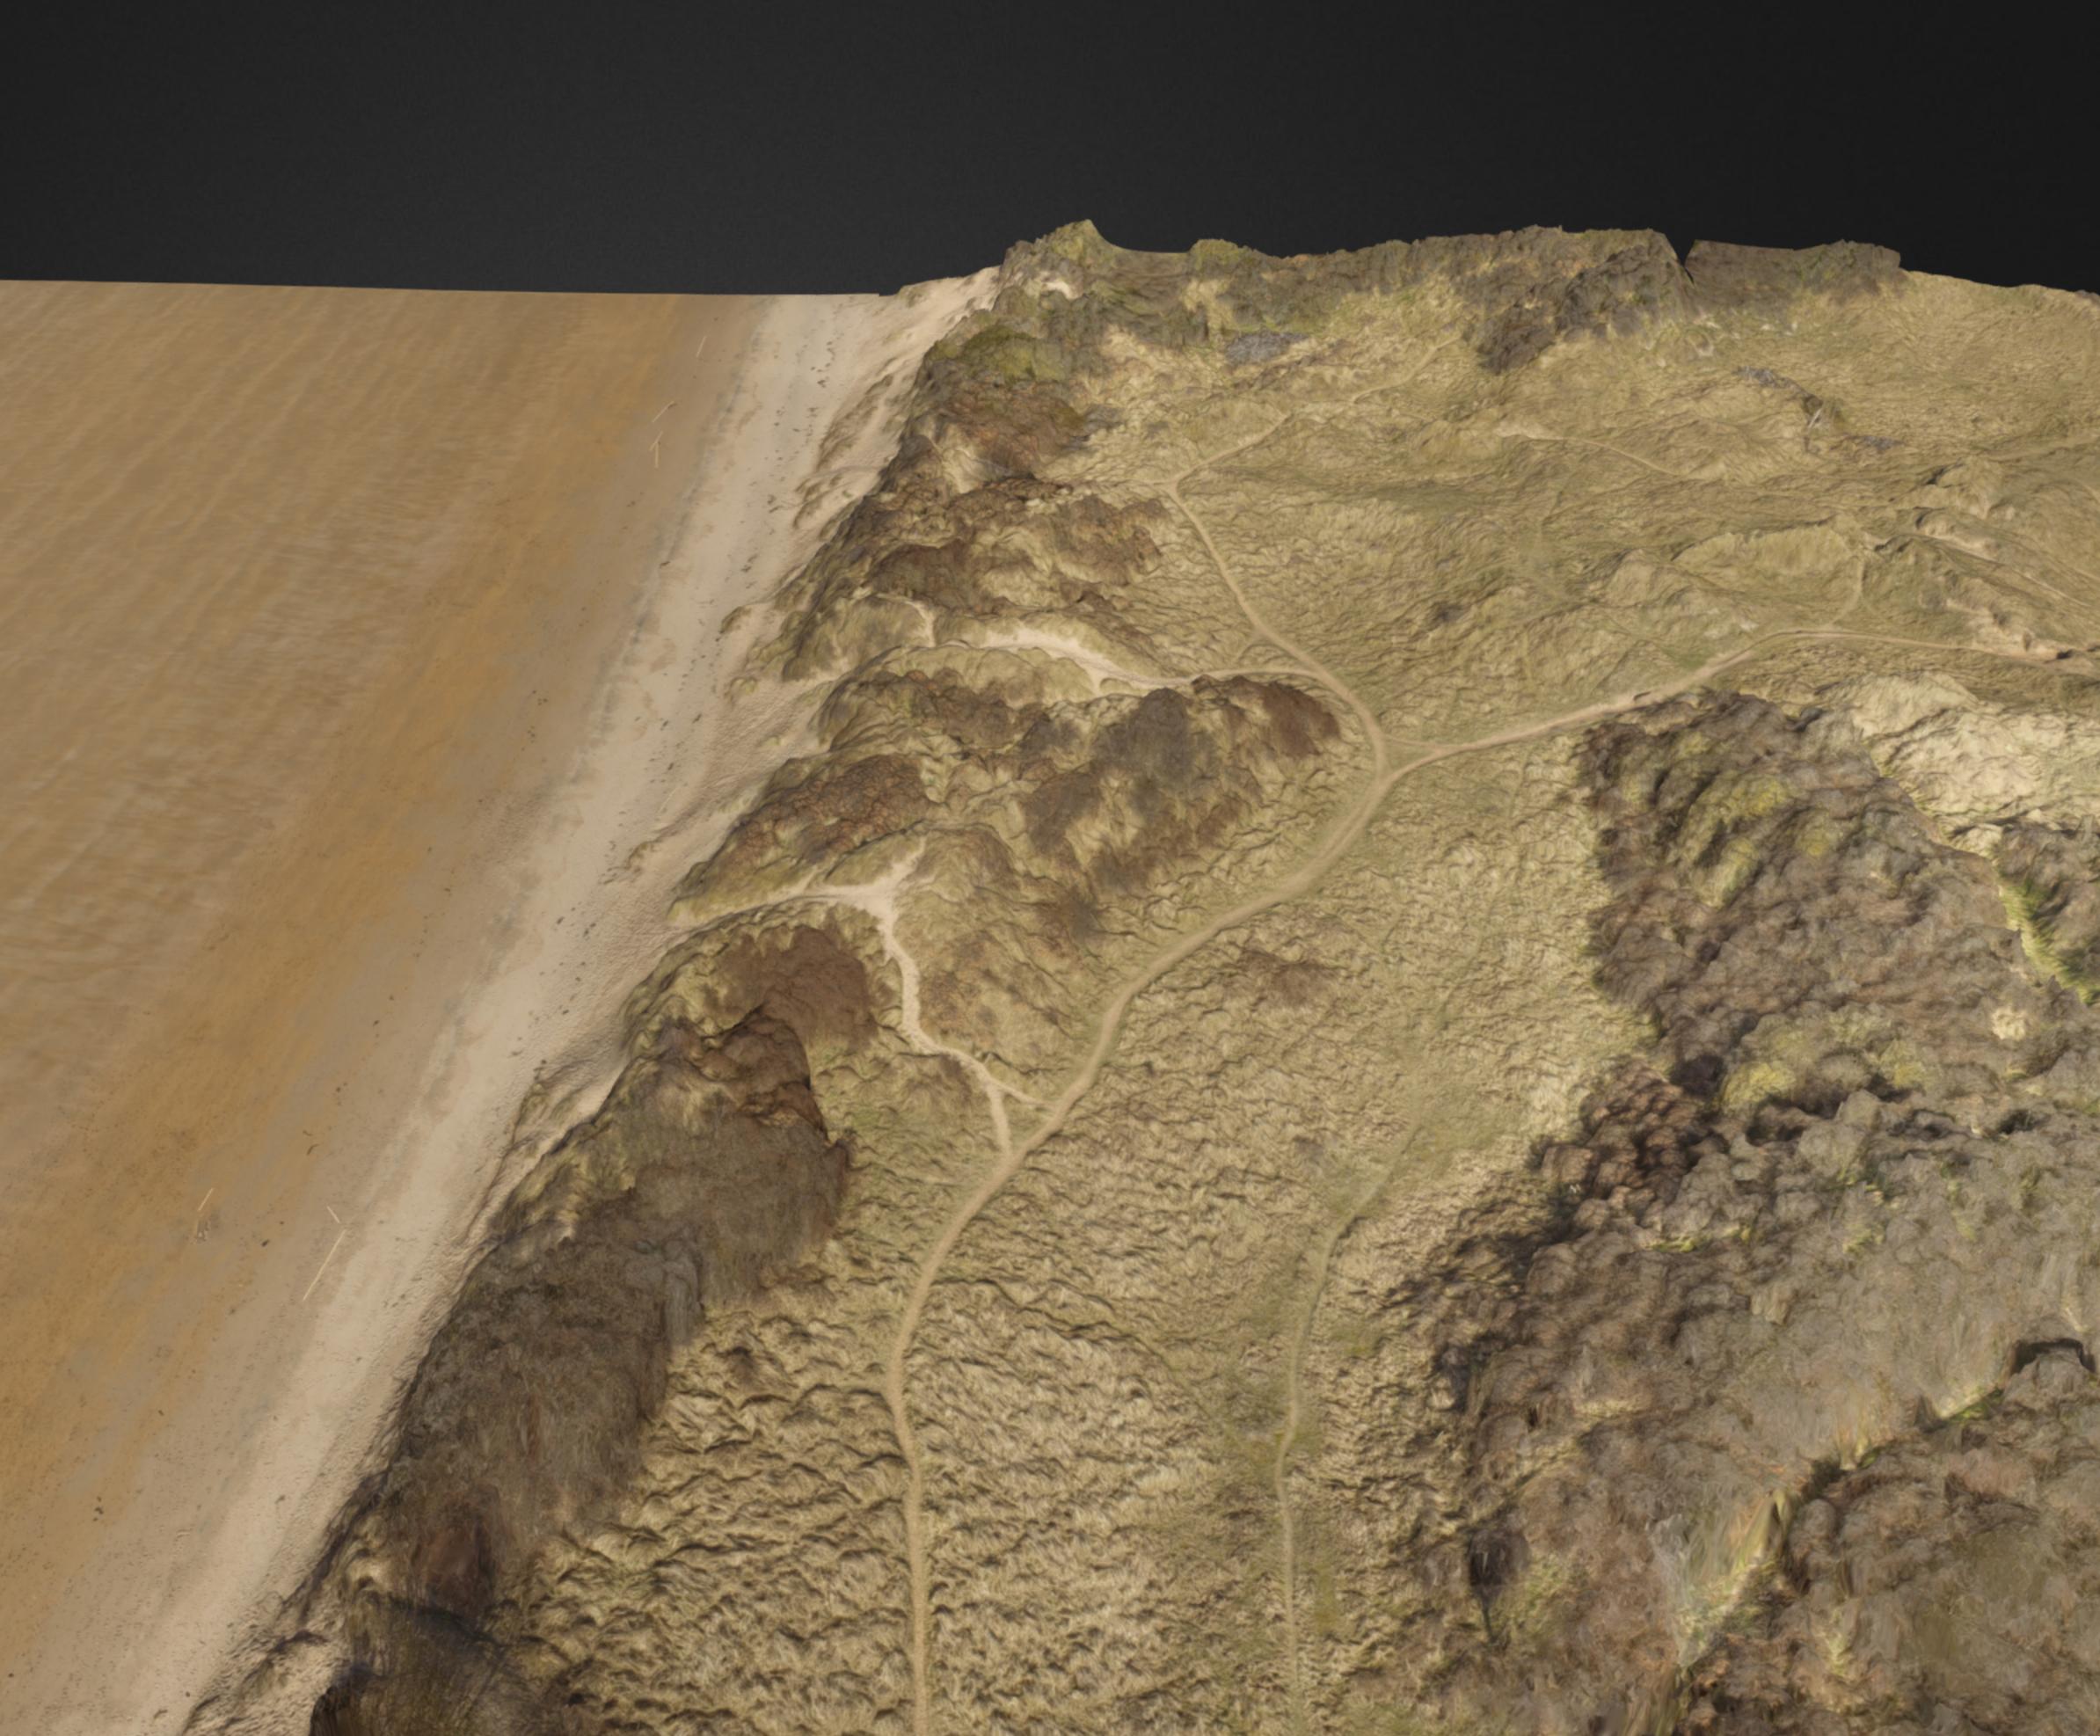 3D vegetation model by drone